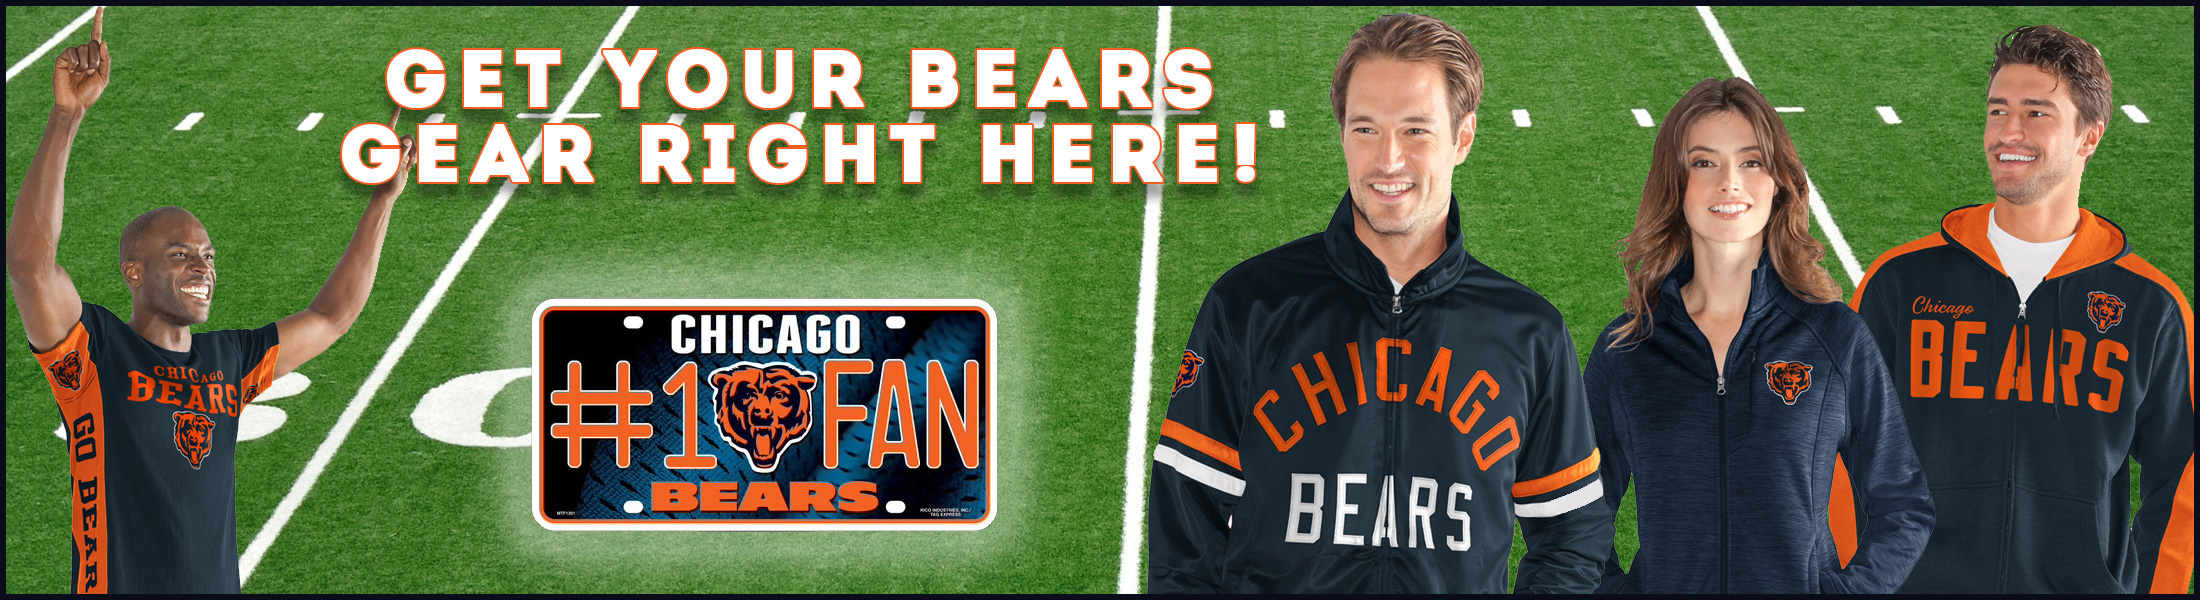 Chicago Bears Caps, Shirts, Sweatshirts & More at SportsWorldChicago.com